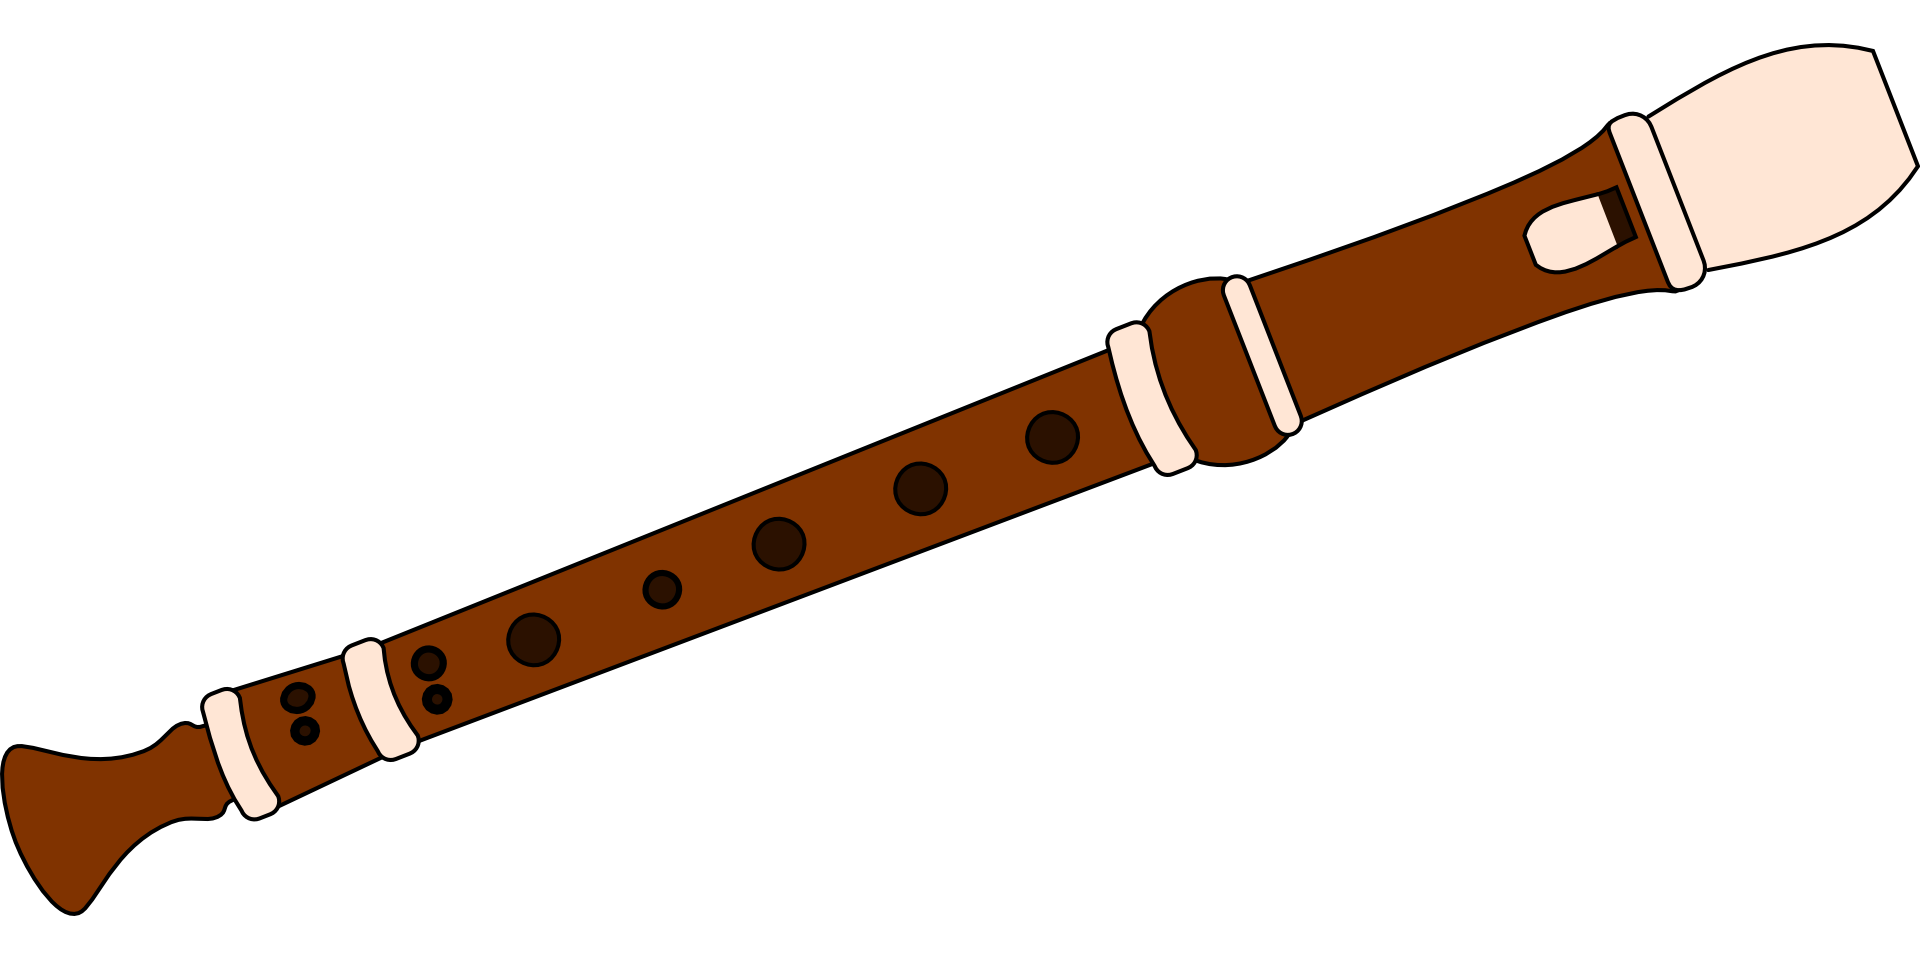 Flutes clipart clip art. Recorder musical instrument flute